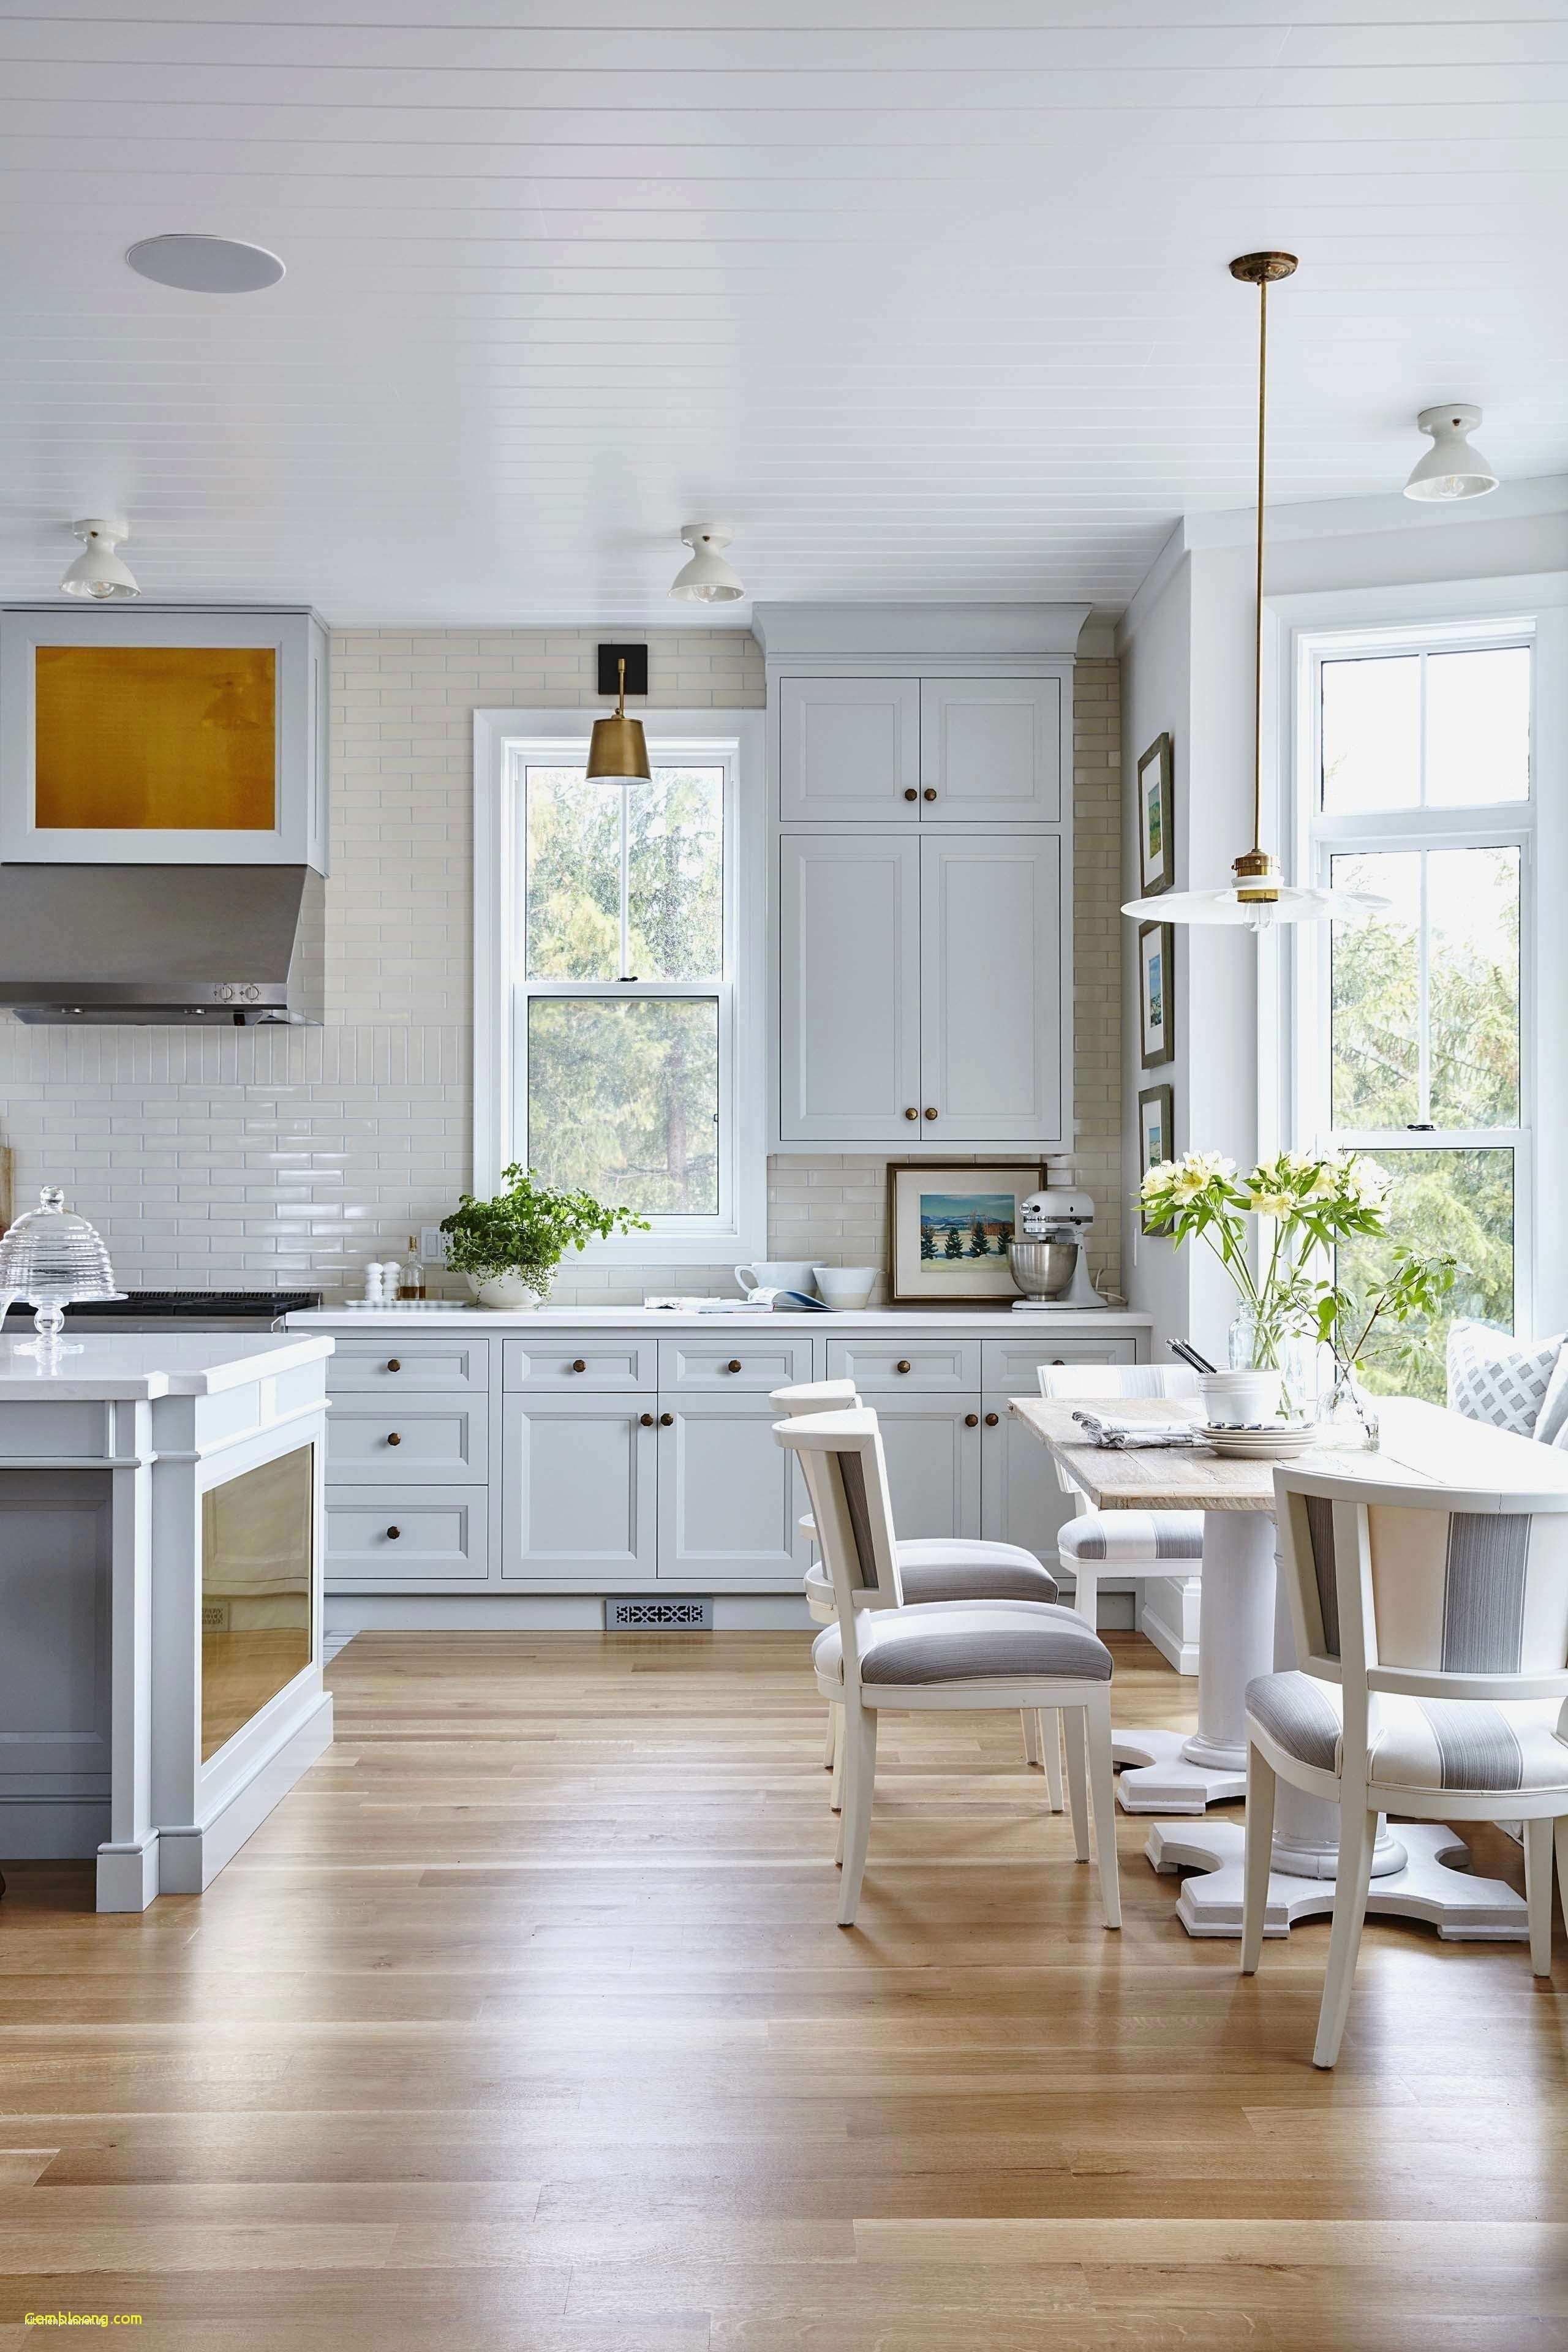 best hardwood floor for basement of wood for floors facesinnature within kitchen joys kitchen joys kitchen 0d kitchens design ideas design scheme small house storage